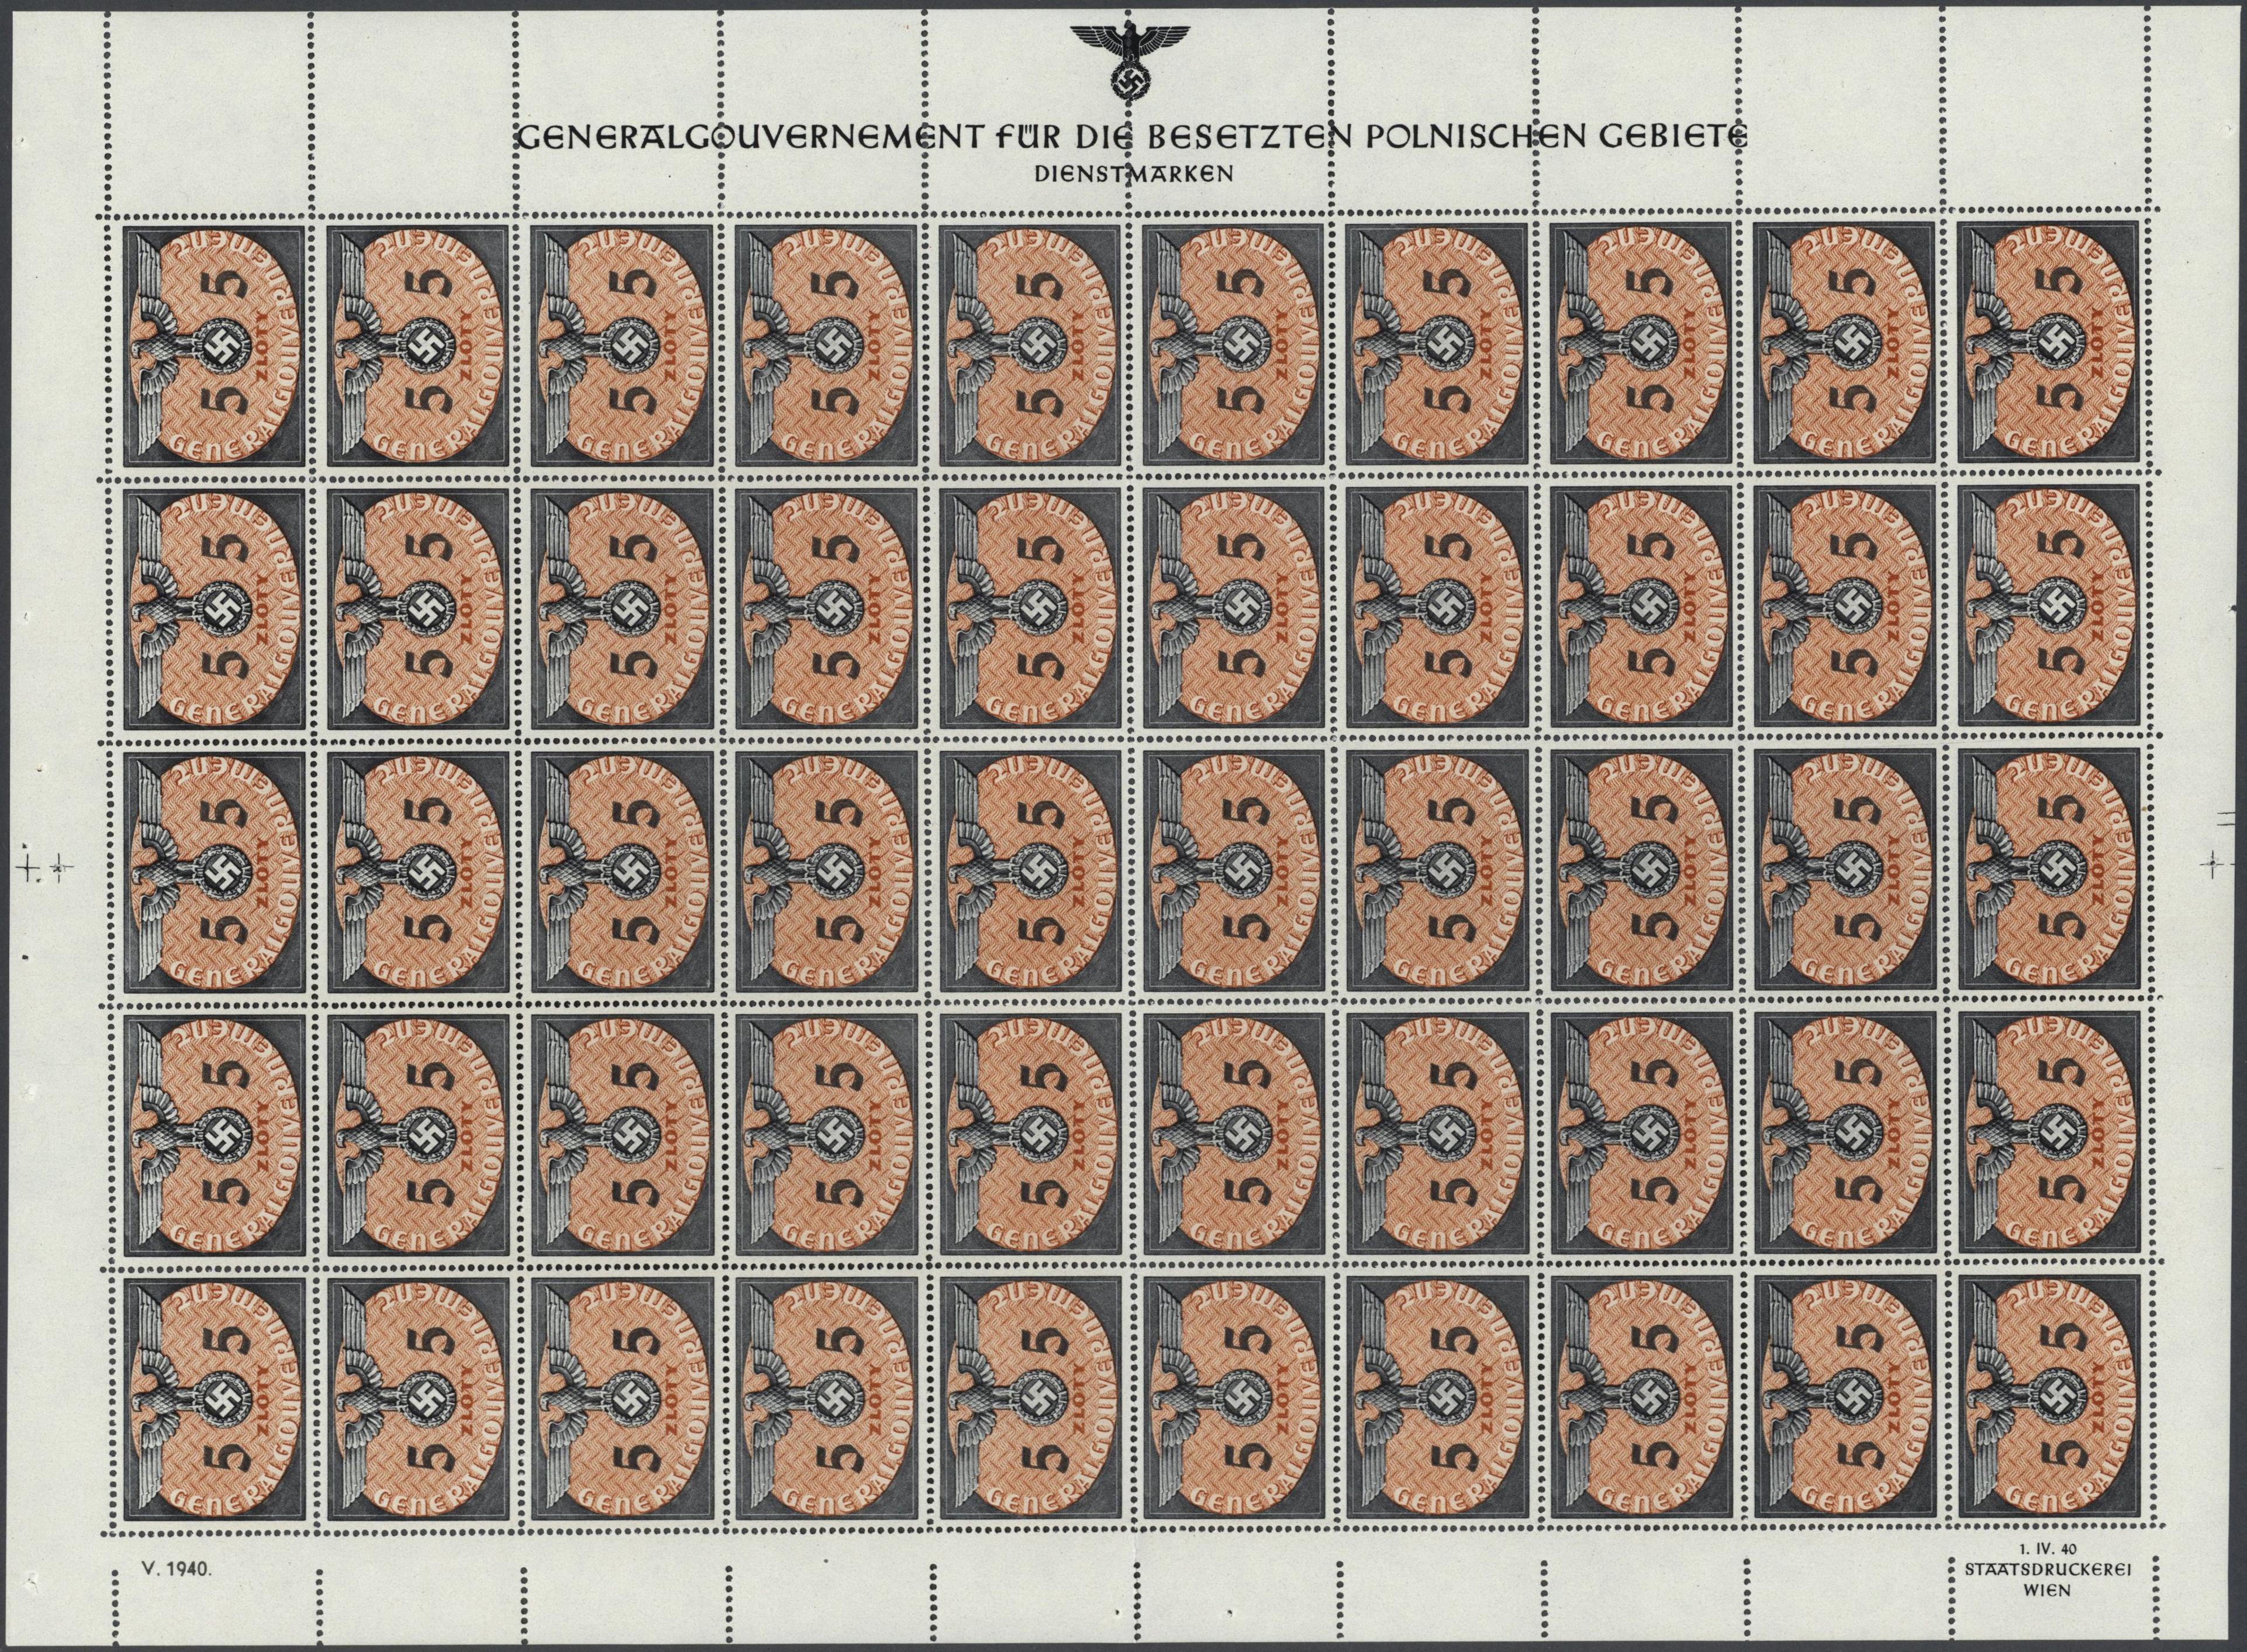 Lot 28973 - Dt. Besetzung II WK - Generalgouvernement - Dienstmarken  -  Auktionshaus Christoph Gärtner GmbH & Co. KG Sale #46 Gollcetions Germany - including the suplement